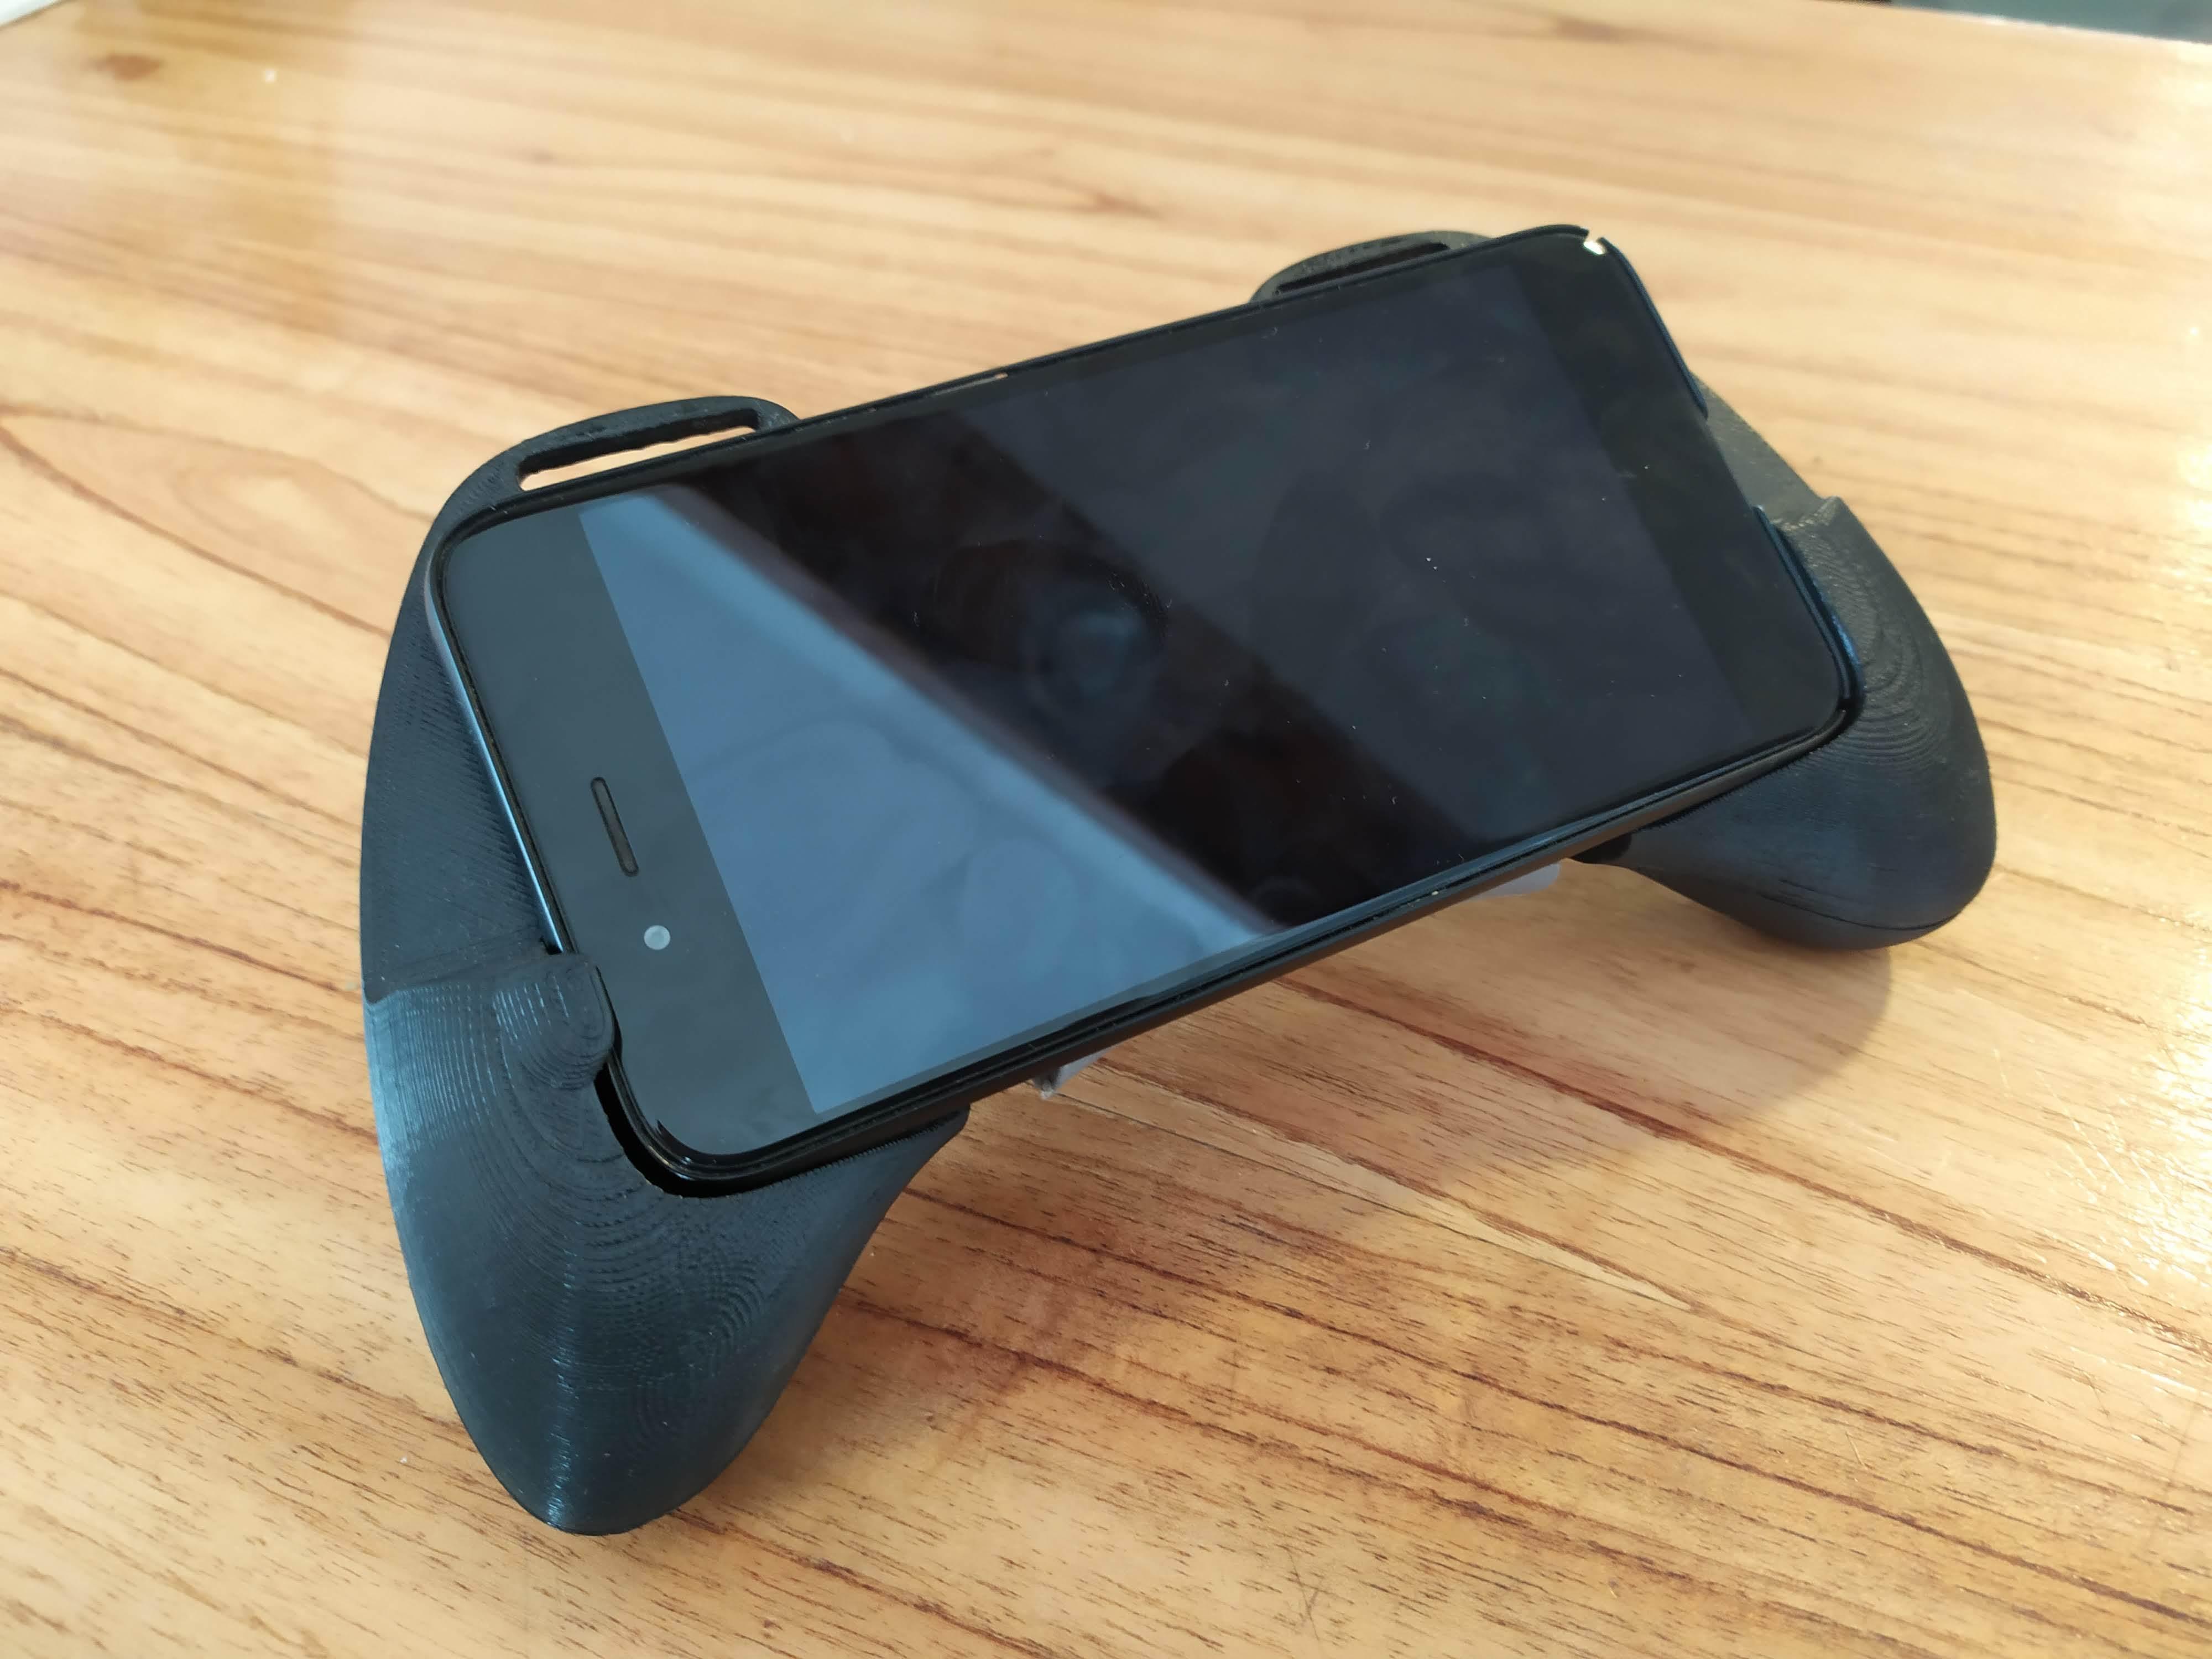 IMG_20191121_170217.jpg Download STL file Gaming Grip for Smartphones • 3D printing template, SOLIDMaker3D